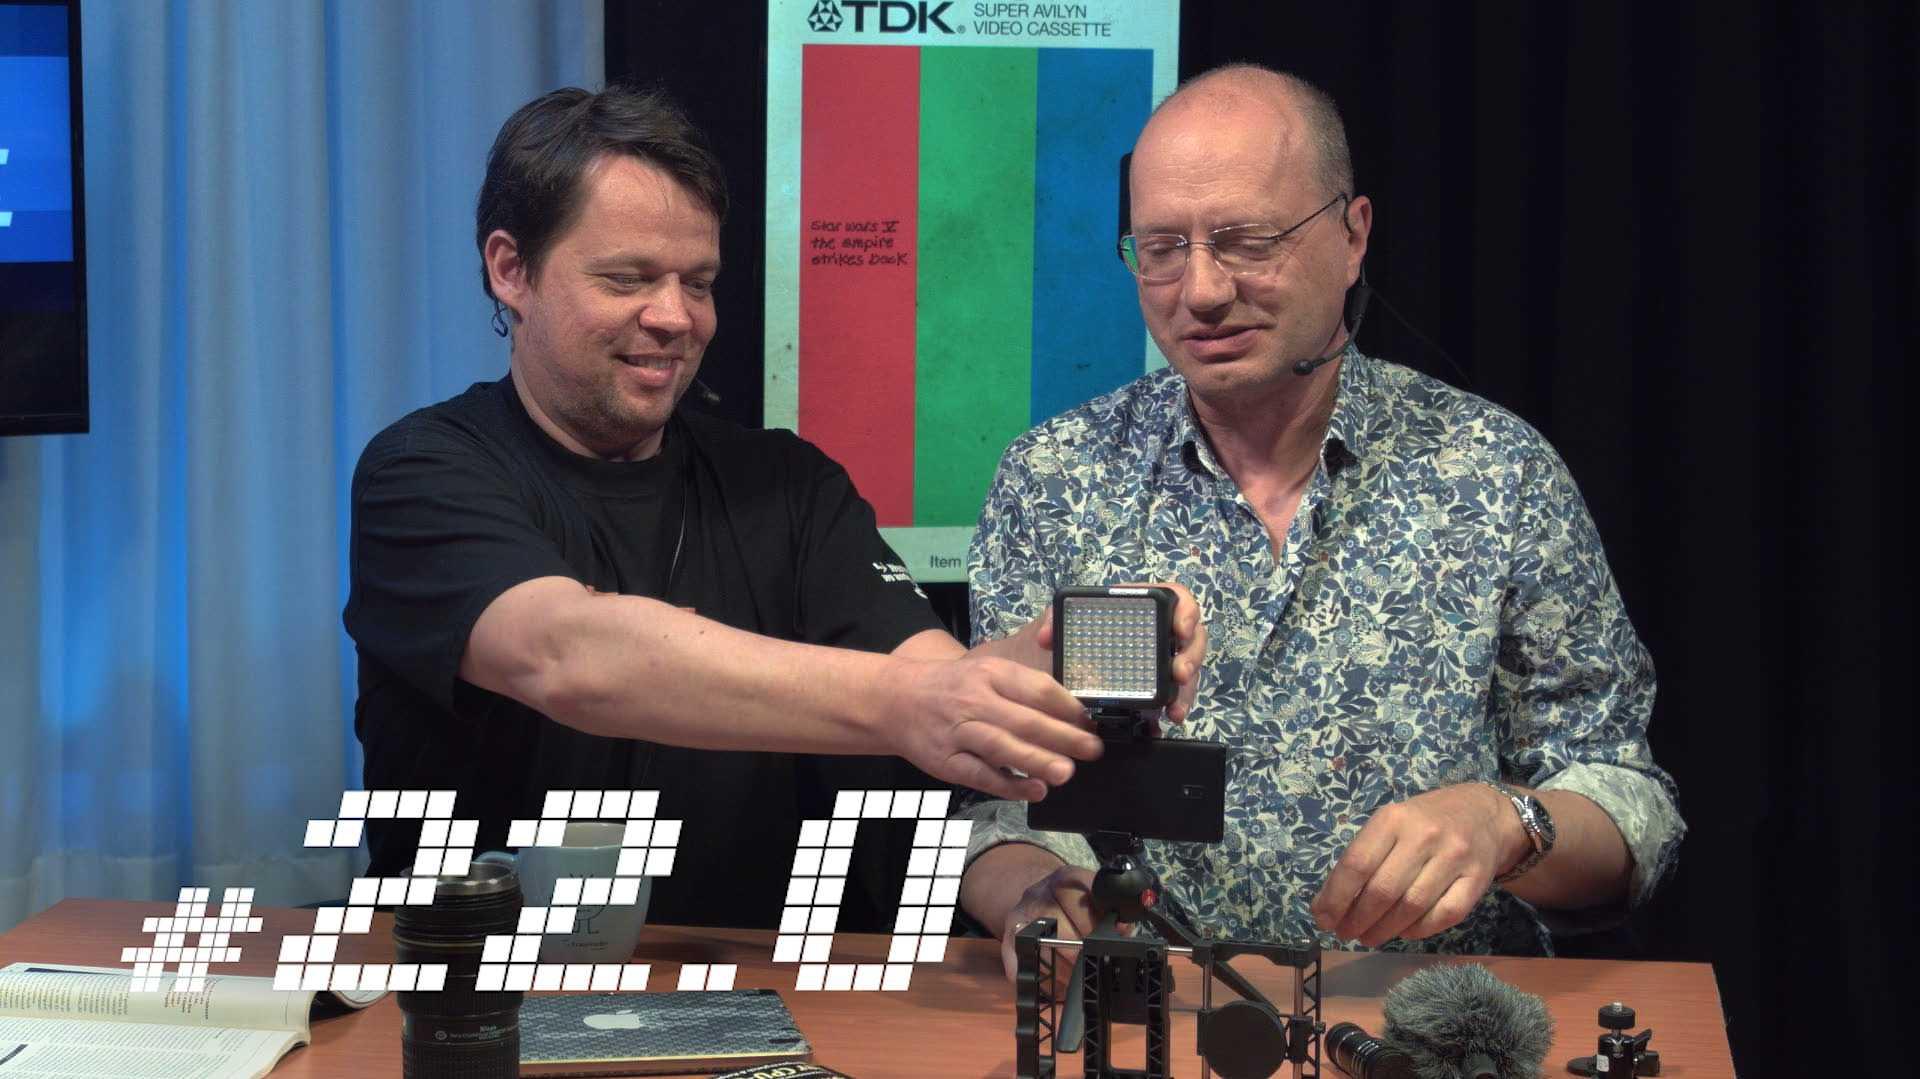 c't uplink 22.0: Handy-Videos im Profi-Look, autonome Busse, CPU-Guide